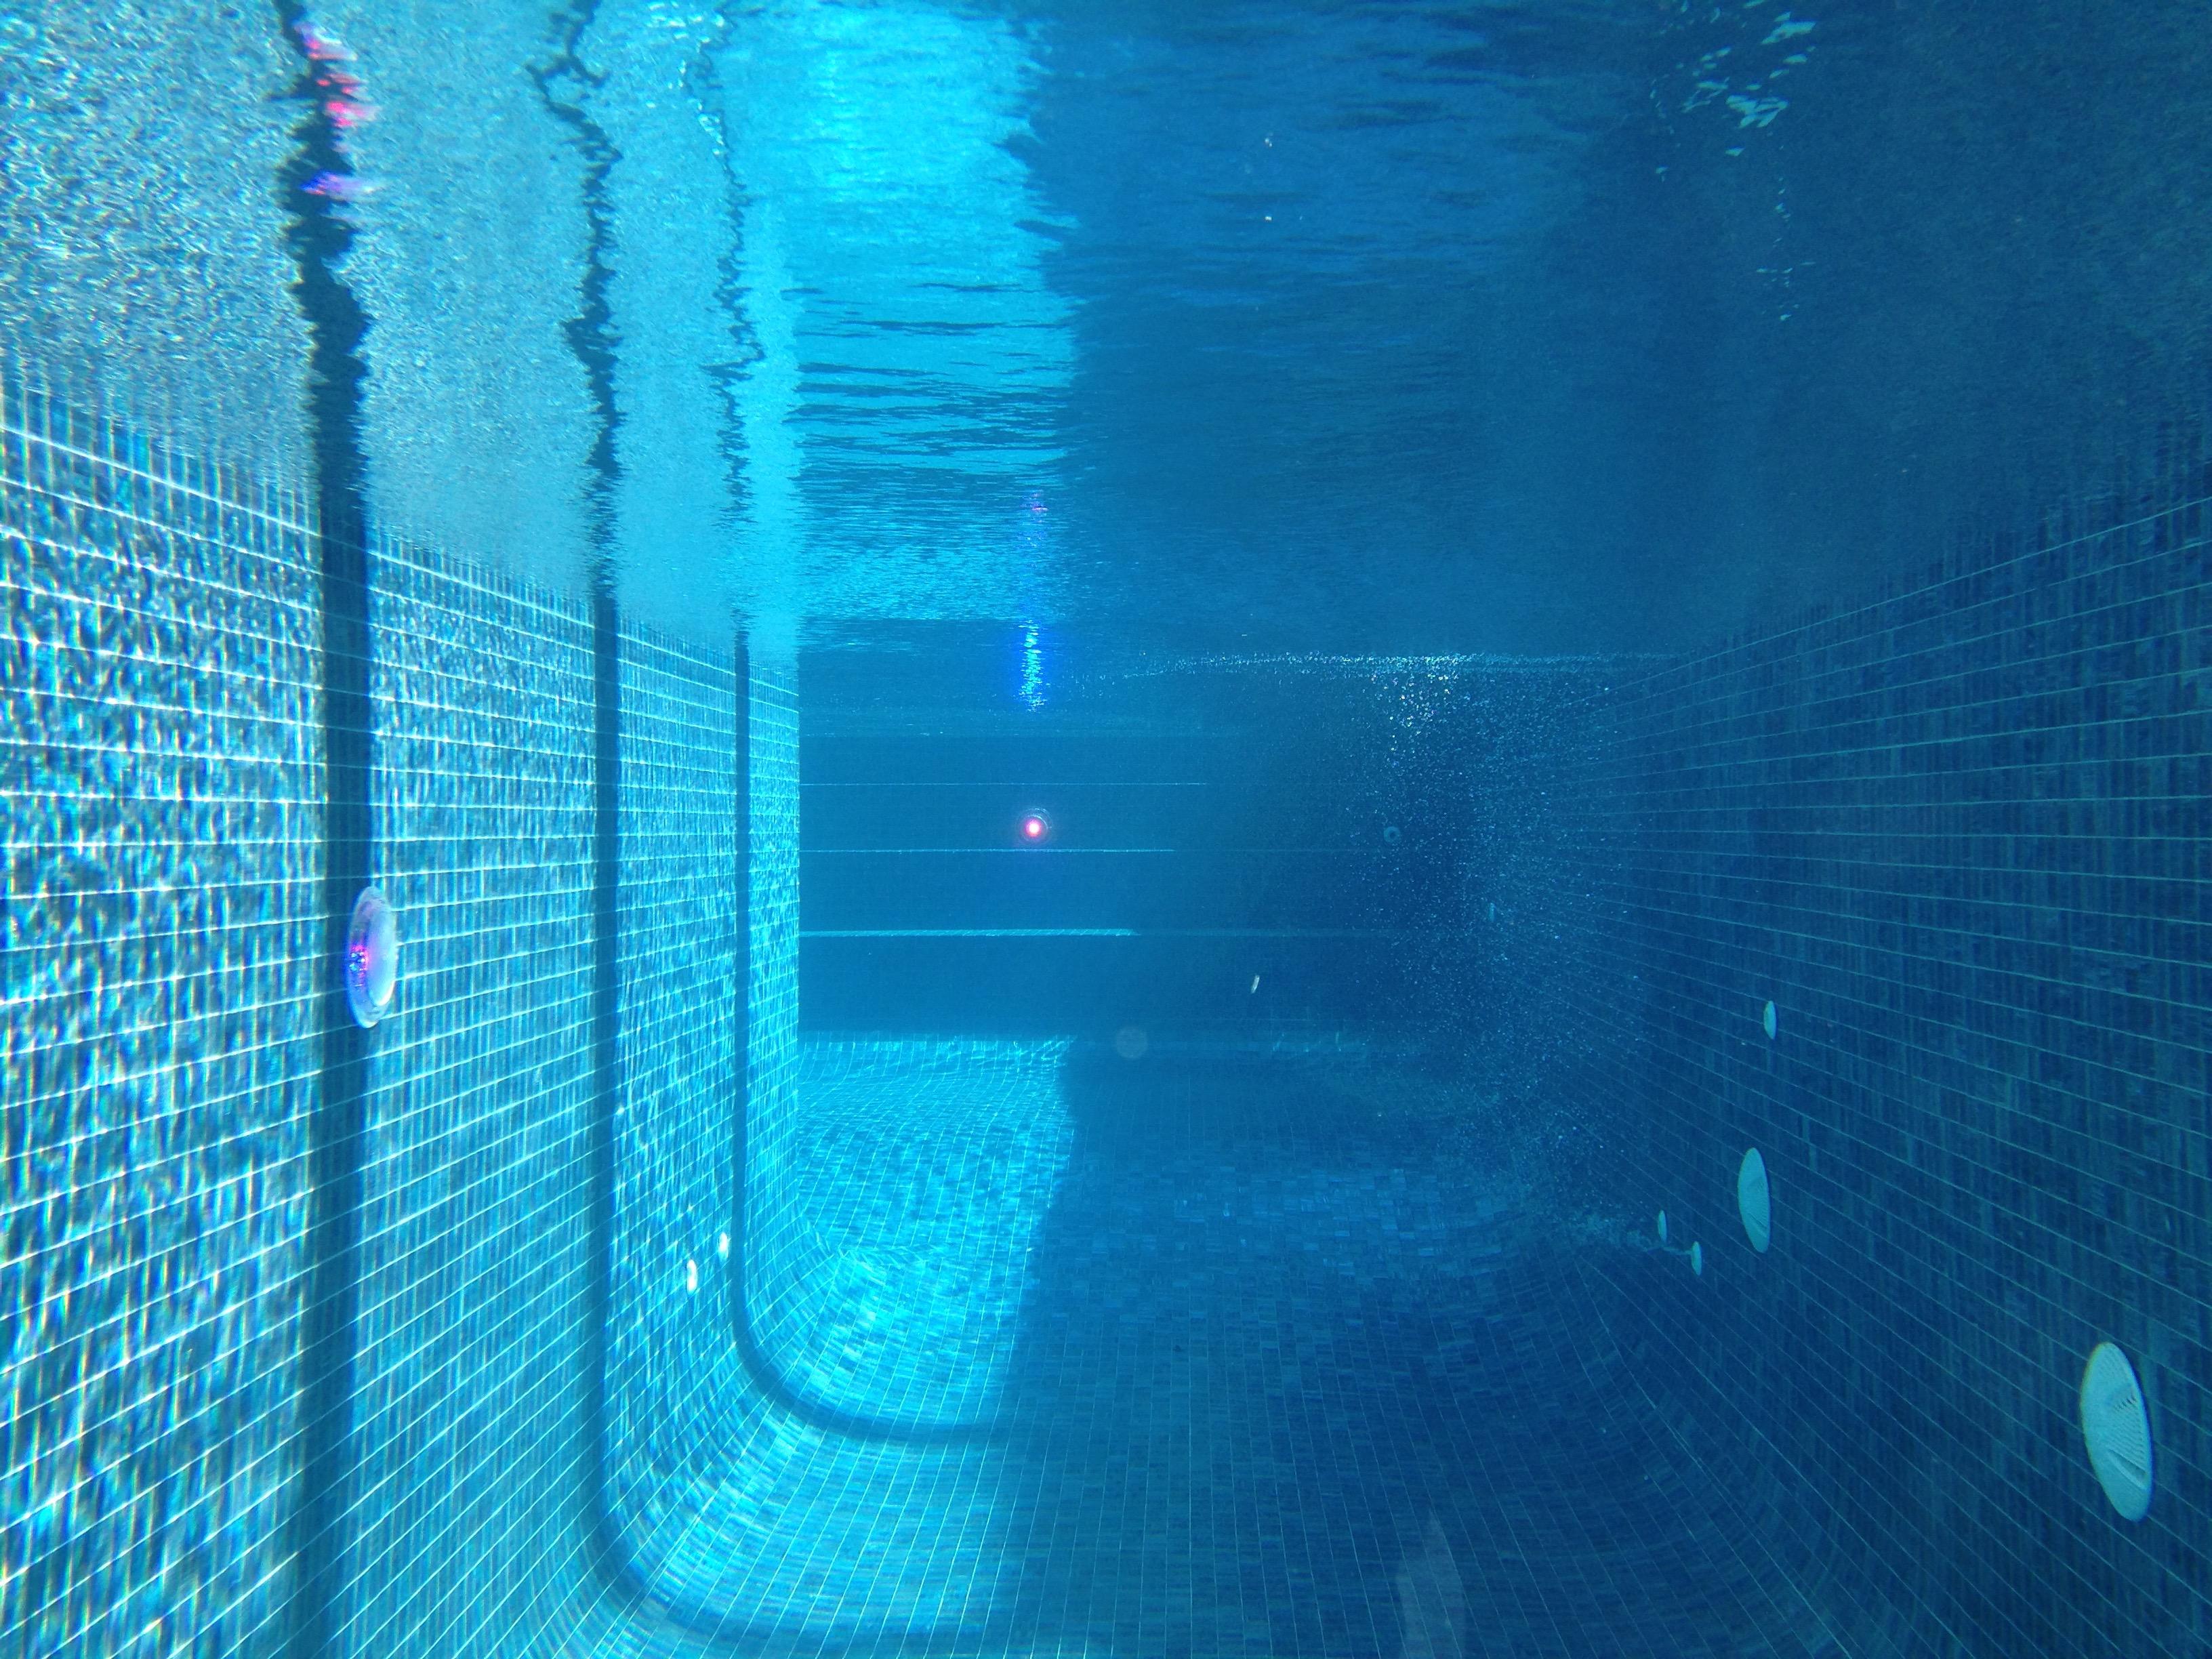 Underwater Image of a Swimfresh Pool